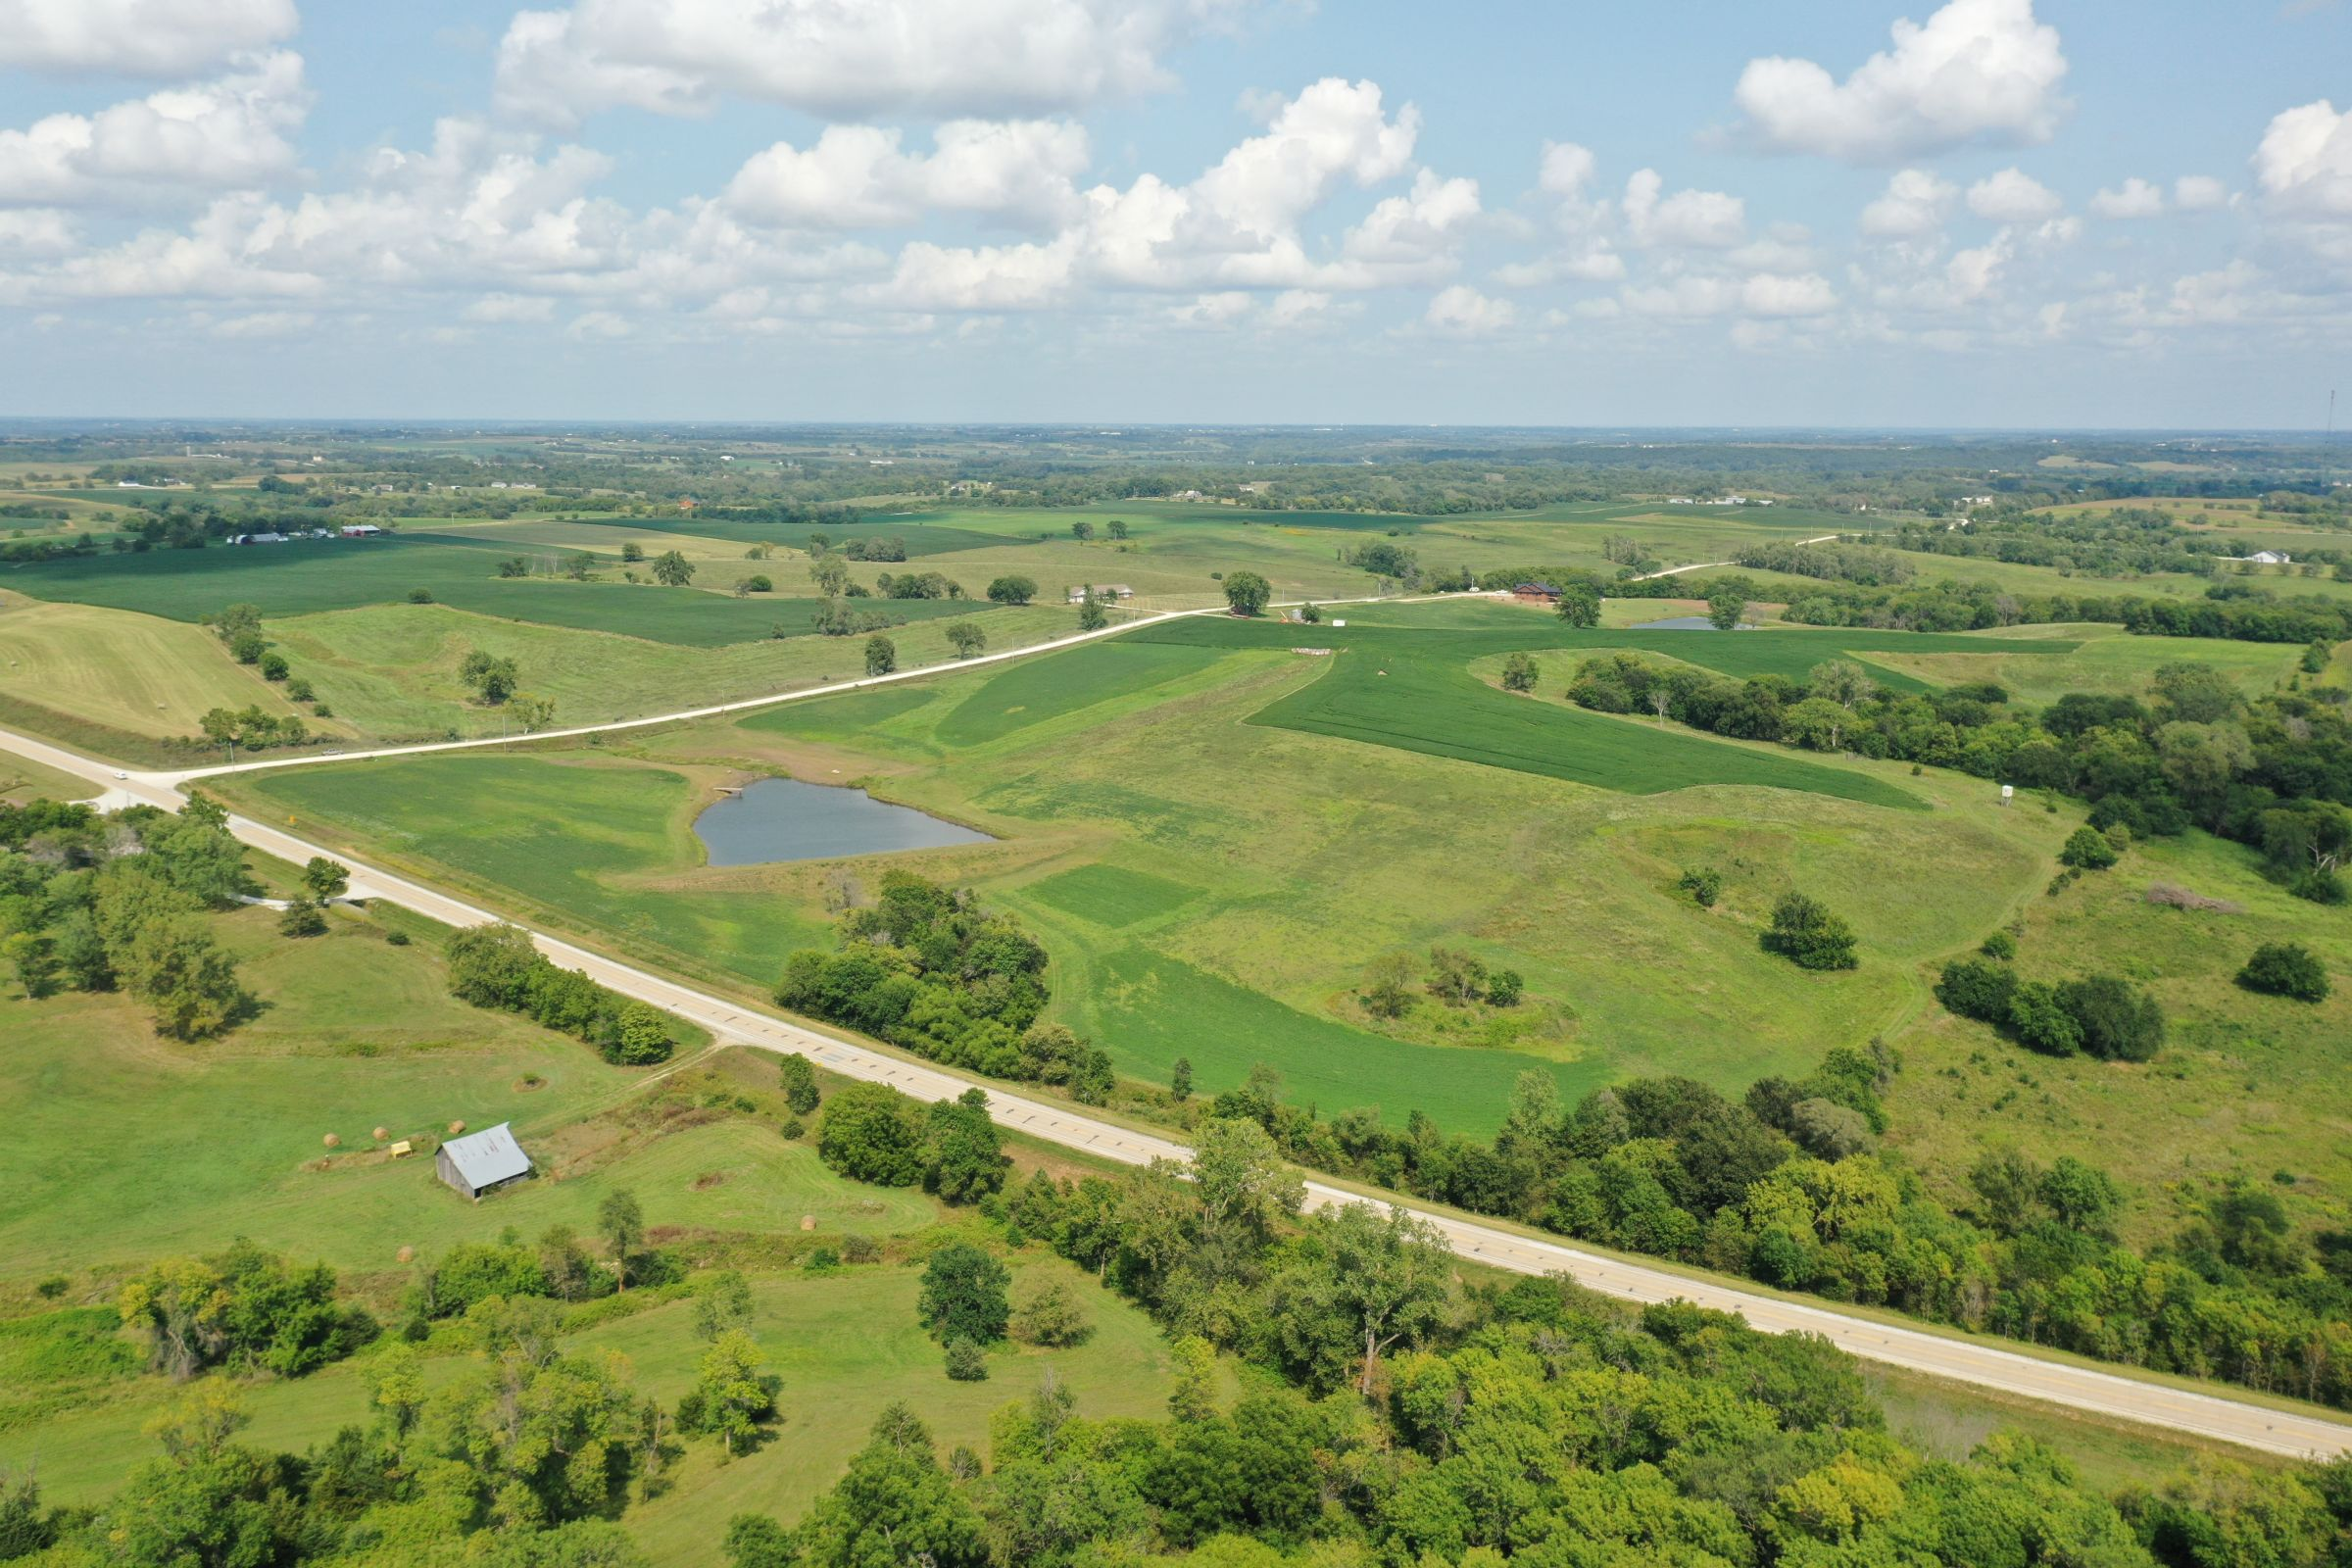 land-warren-county-iowa-9-acres-listing-number-15697-5-2021-08-24-224731.JPG